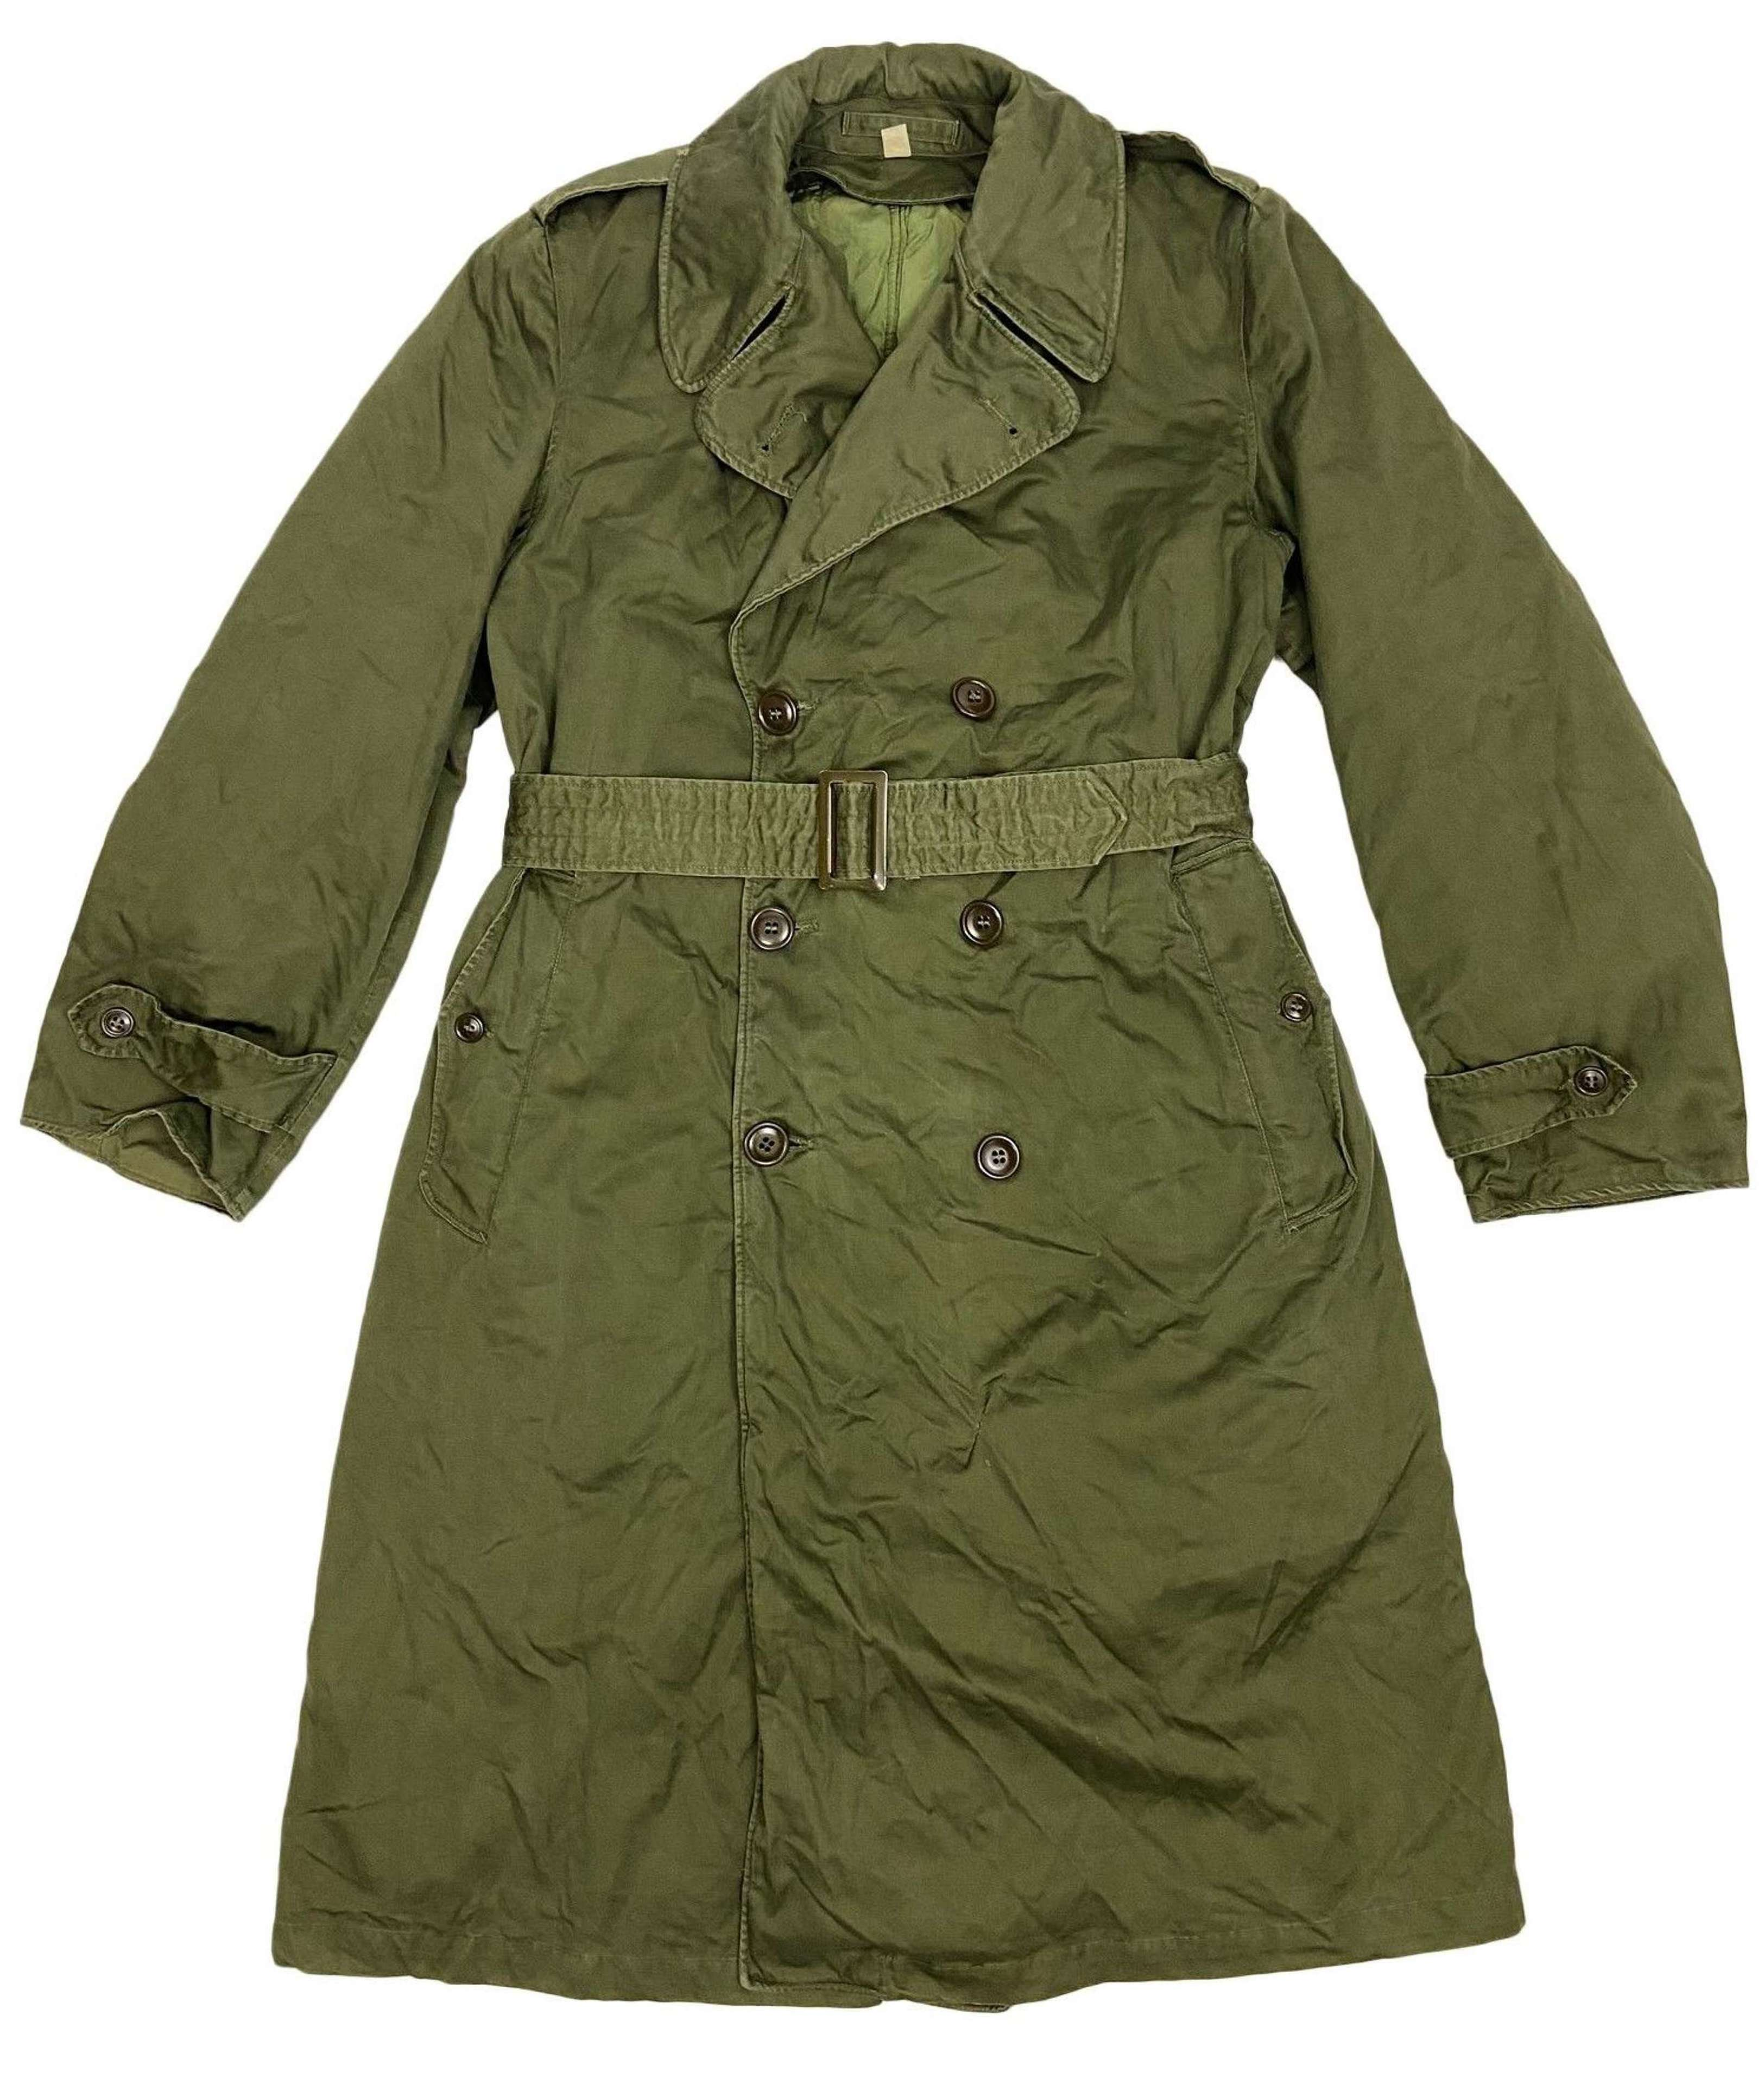 Original 1953 Dated US Army OG107 Raincoat - Size Regular Medium